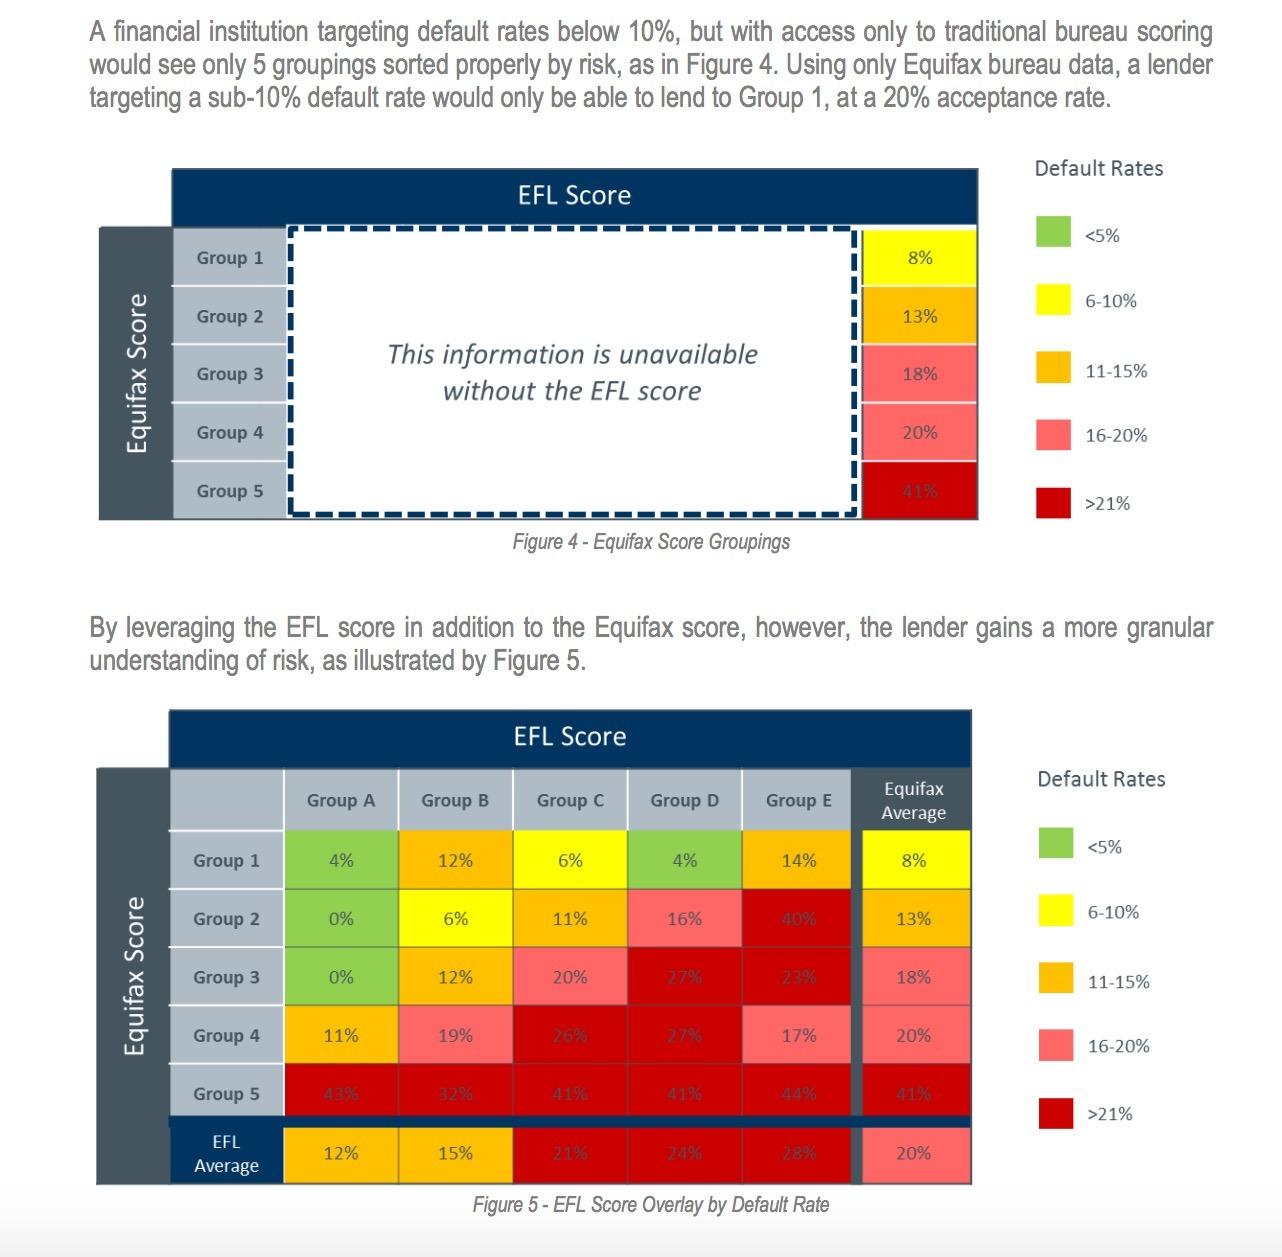 Source: https://www.eflglobal.com/wp-content/uploads/2014/09/EQUIFAX-Case-Study-2014.pdf